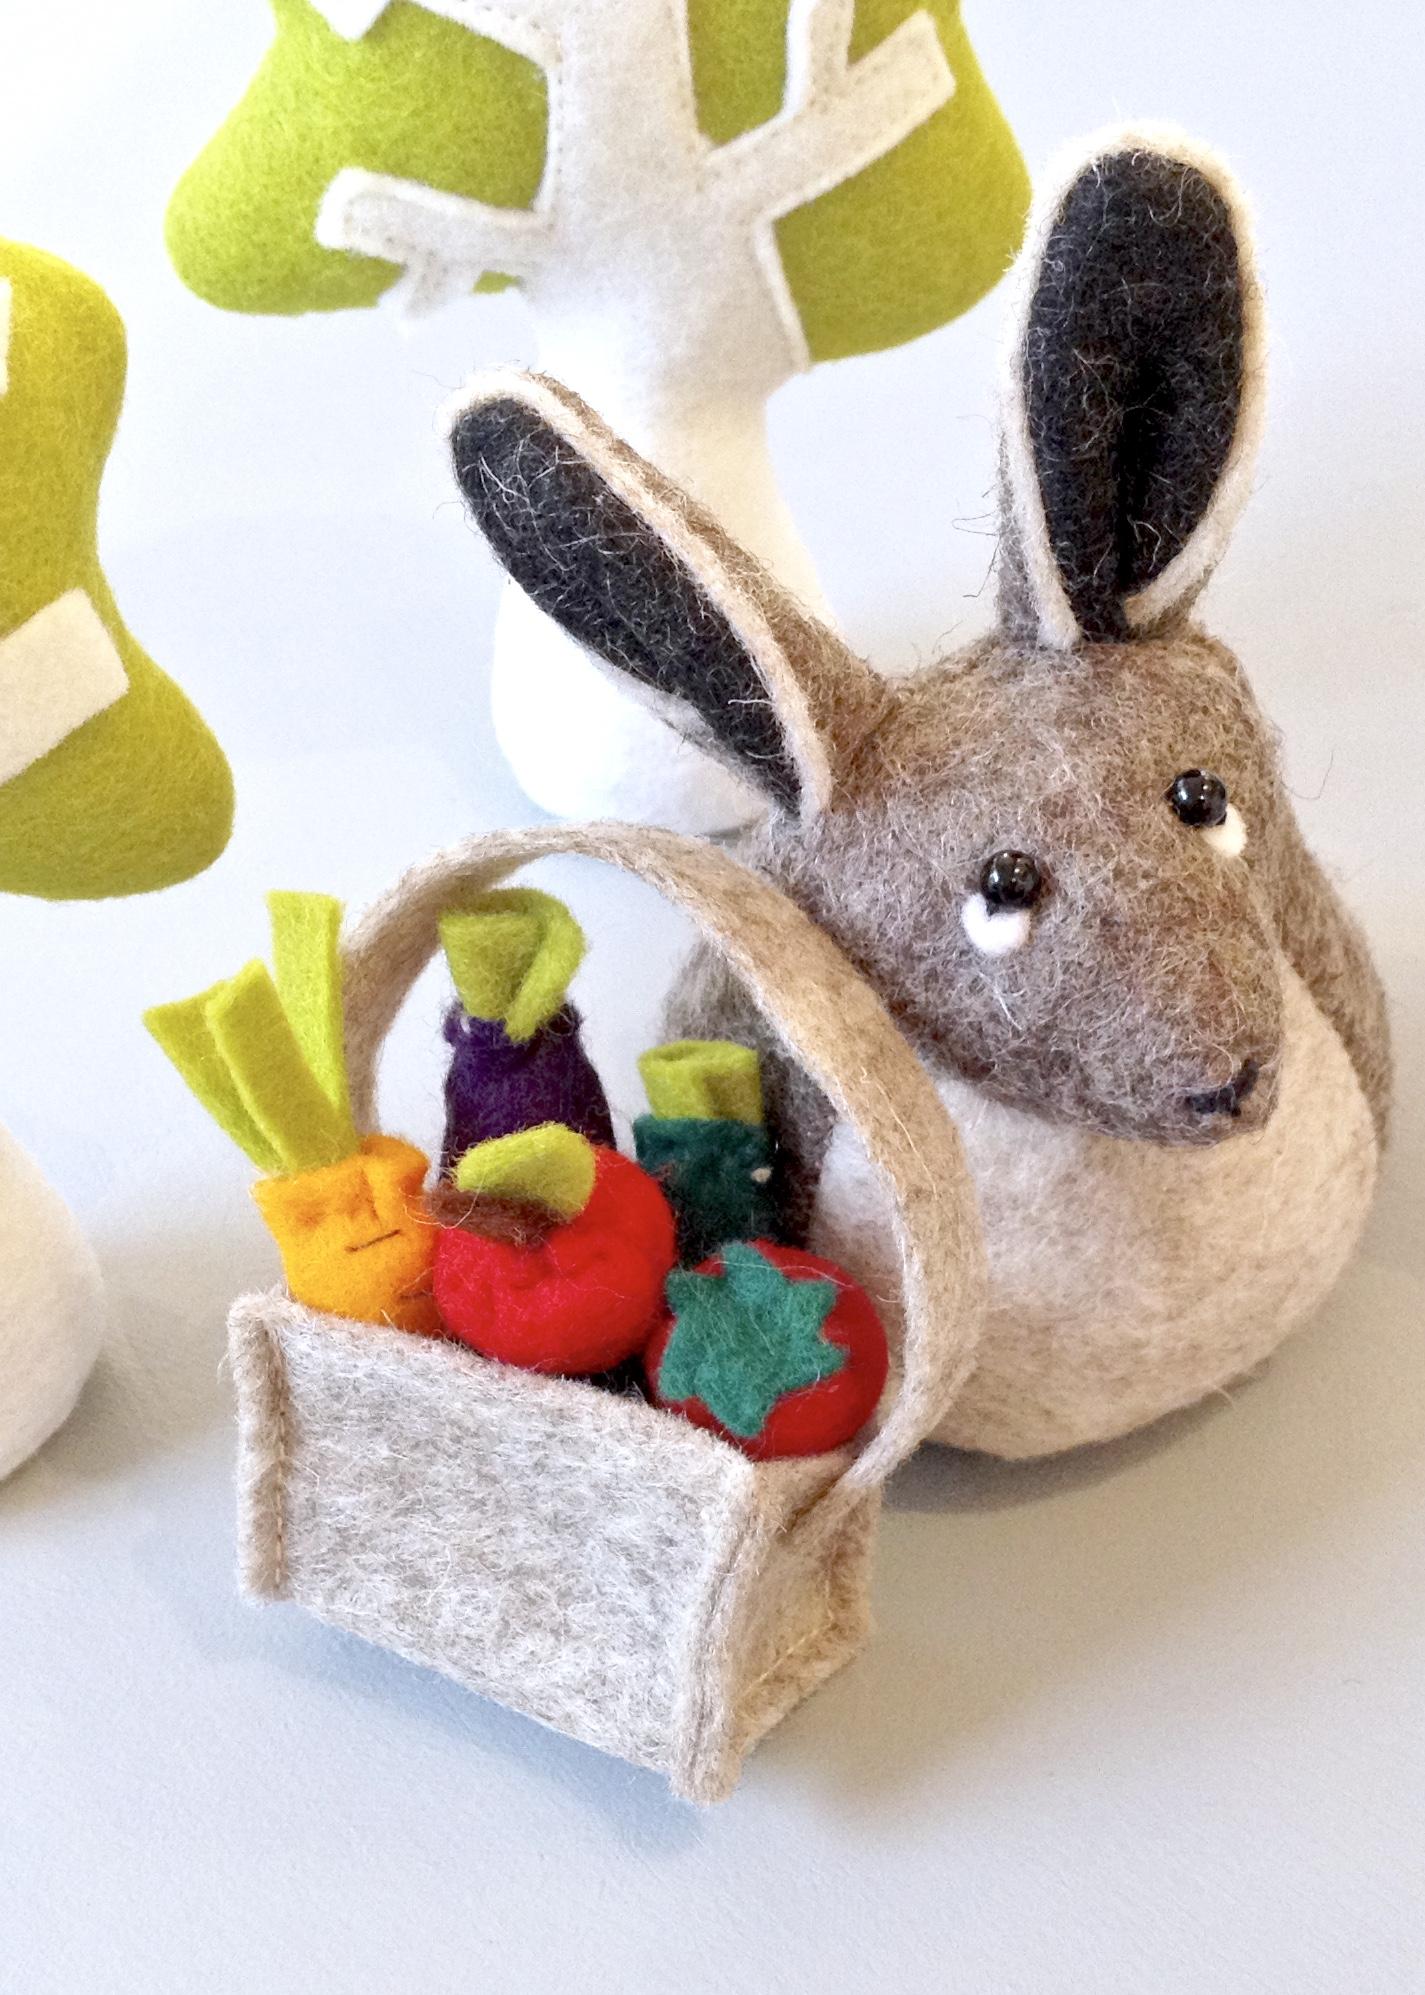 Bilberry Woods Character Henrietta The Hare by Laura Mirjami